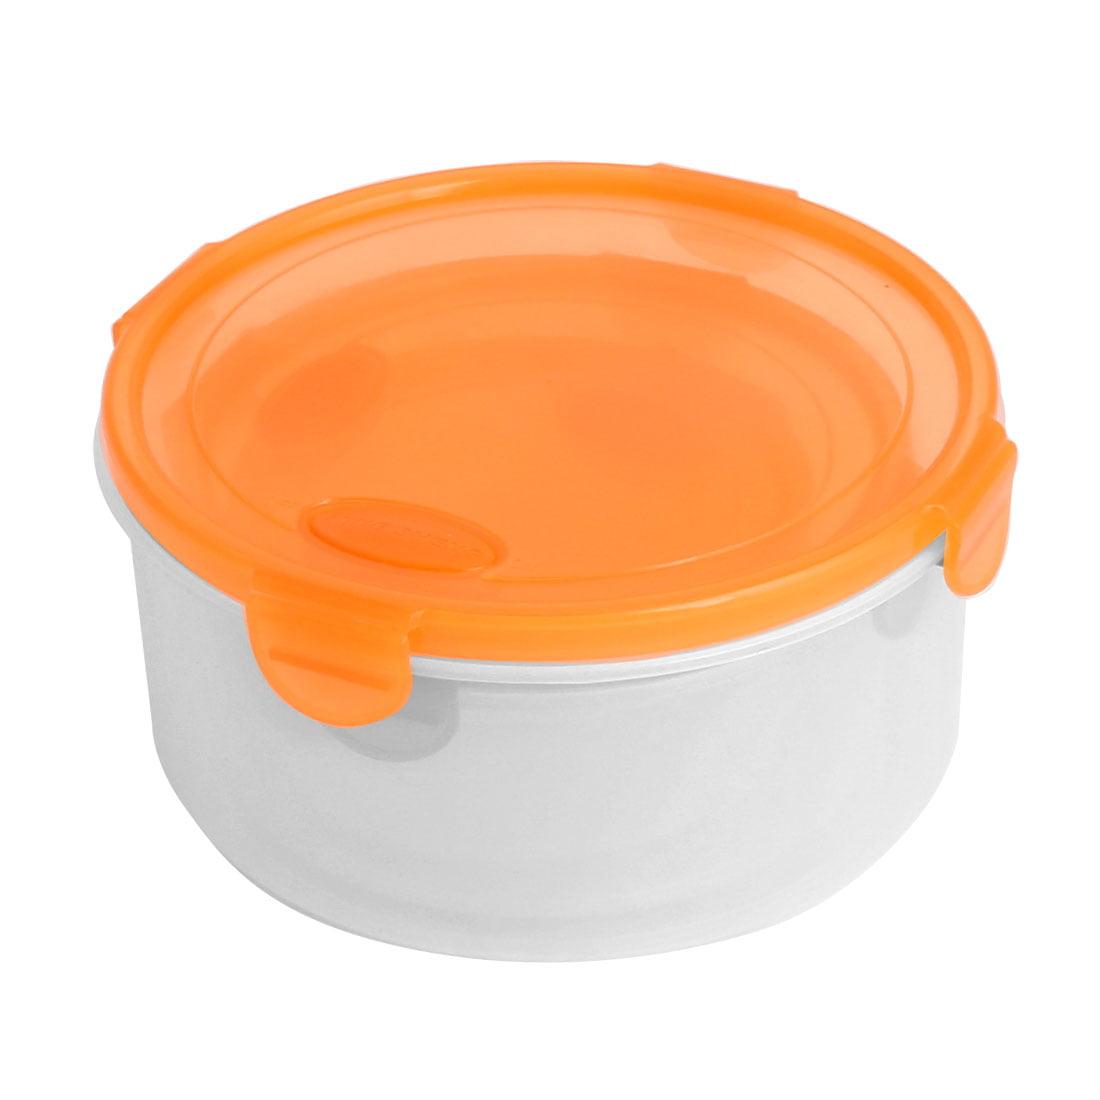 Kitchen Plastic Cylinder Shape Fruit Food Storage Container 3 in 1 Orange White  sc 1 st  Walmart Canada & Kitchen Plastic Cylinder Shape Fruit Food Storage Container 3 in 1 ...